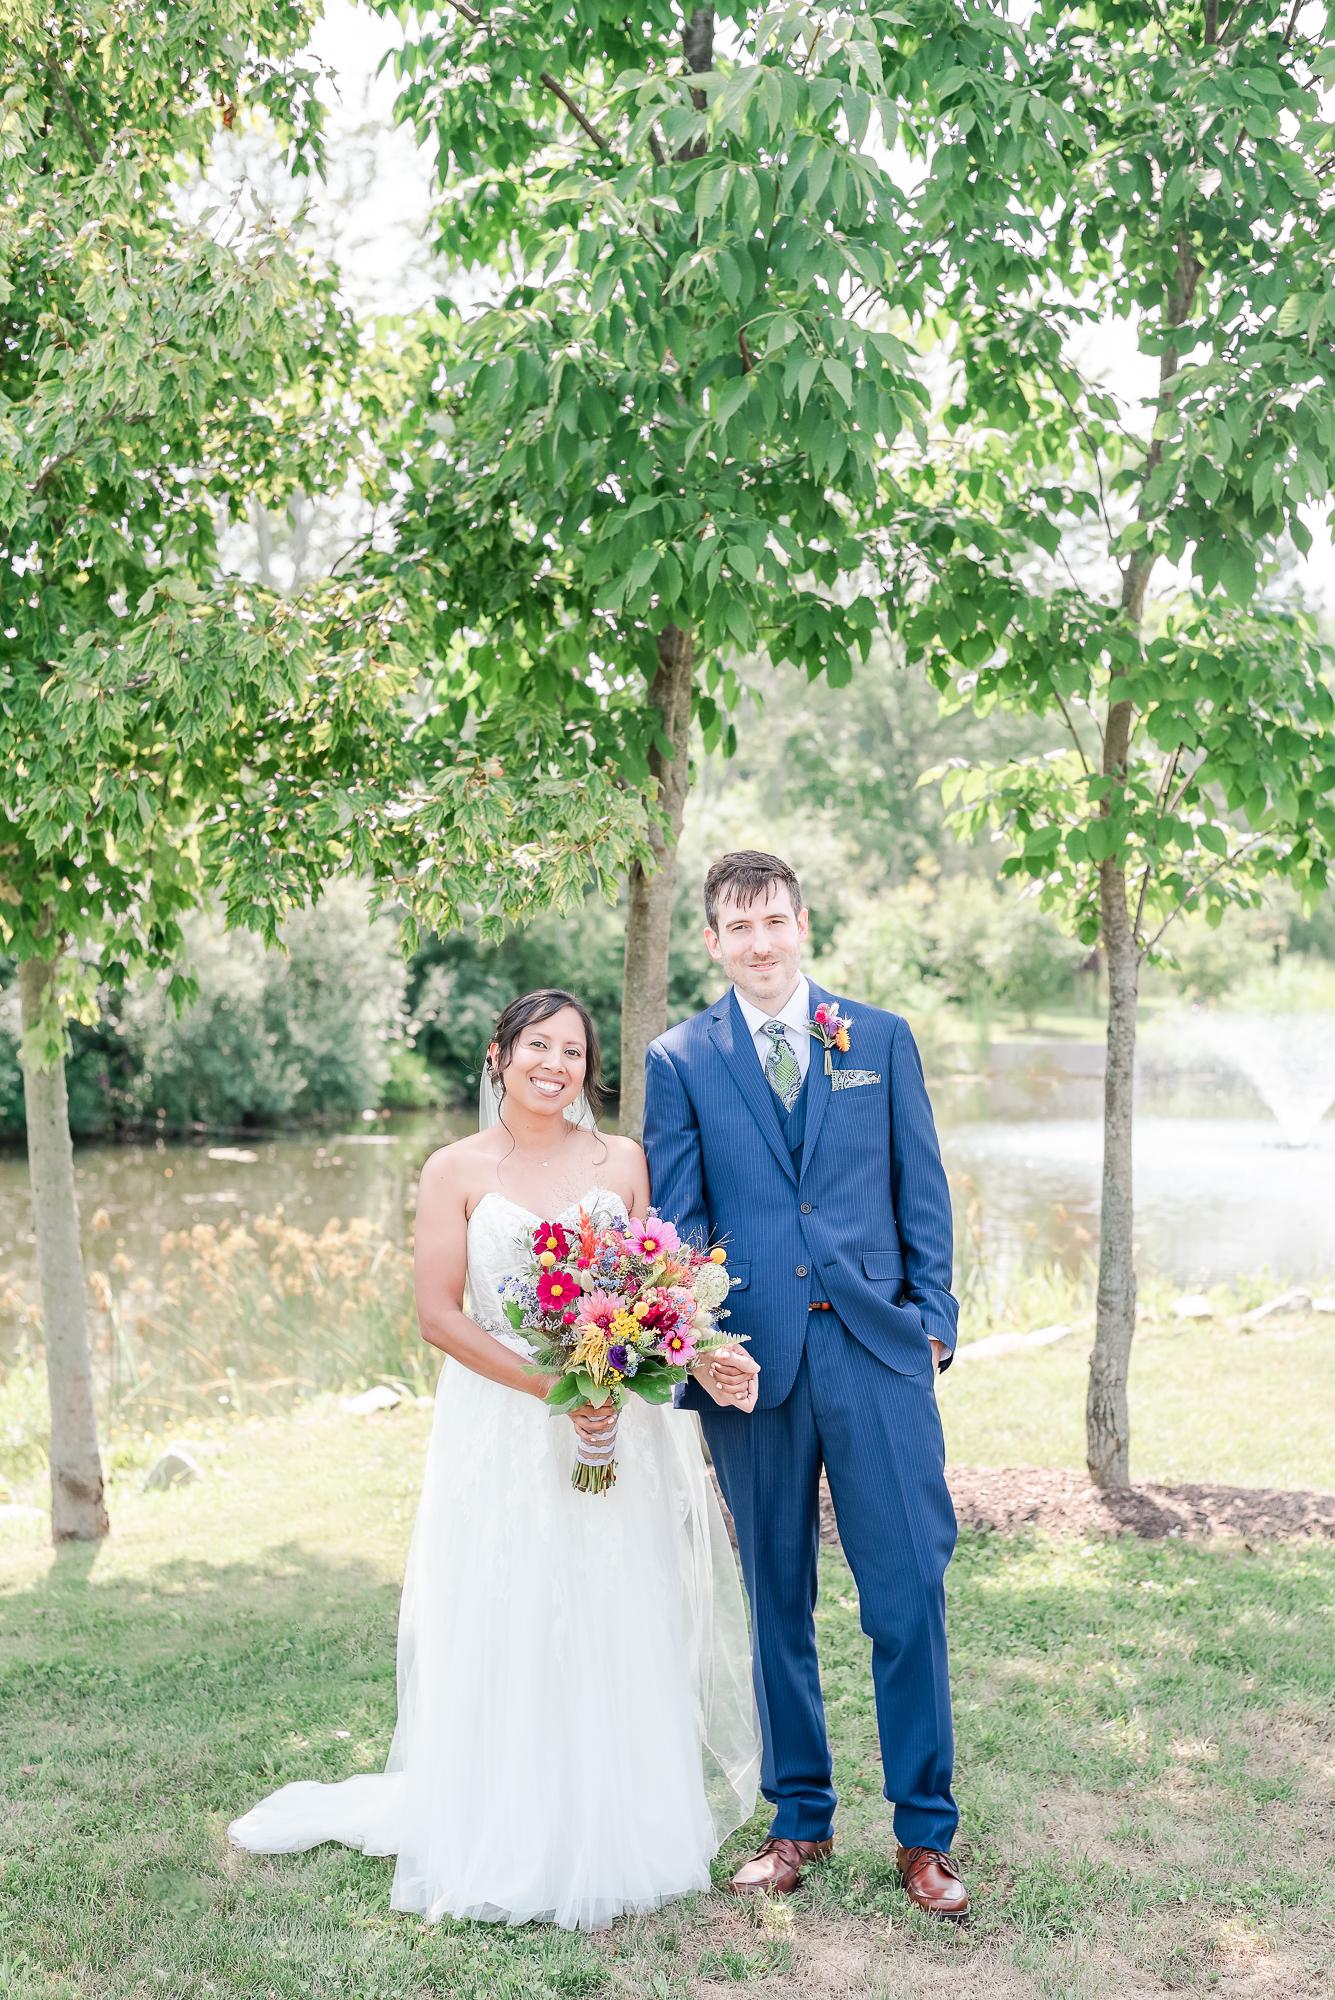 Maria+Adam_Summer Barn Wedding_The Barn and The North Star Preserve_Oberlin_Ohio-128.jpg